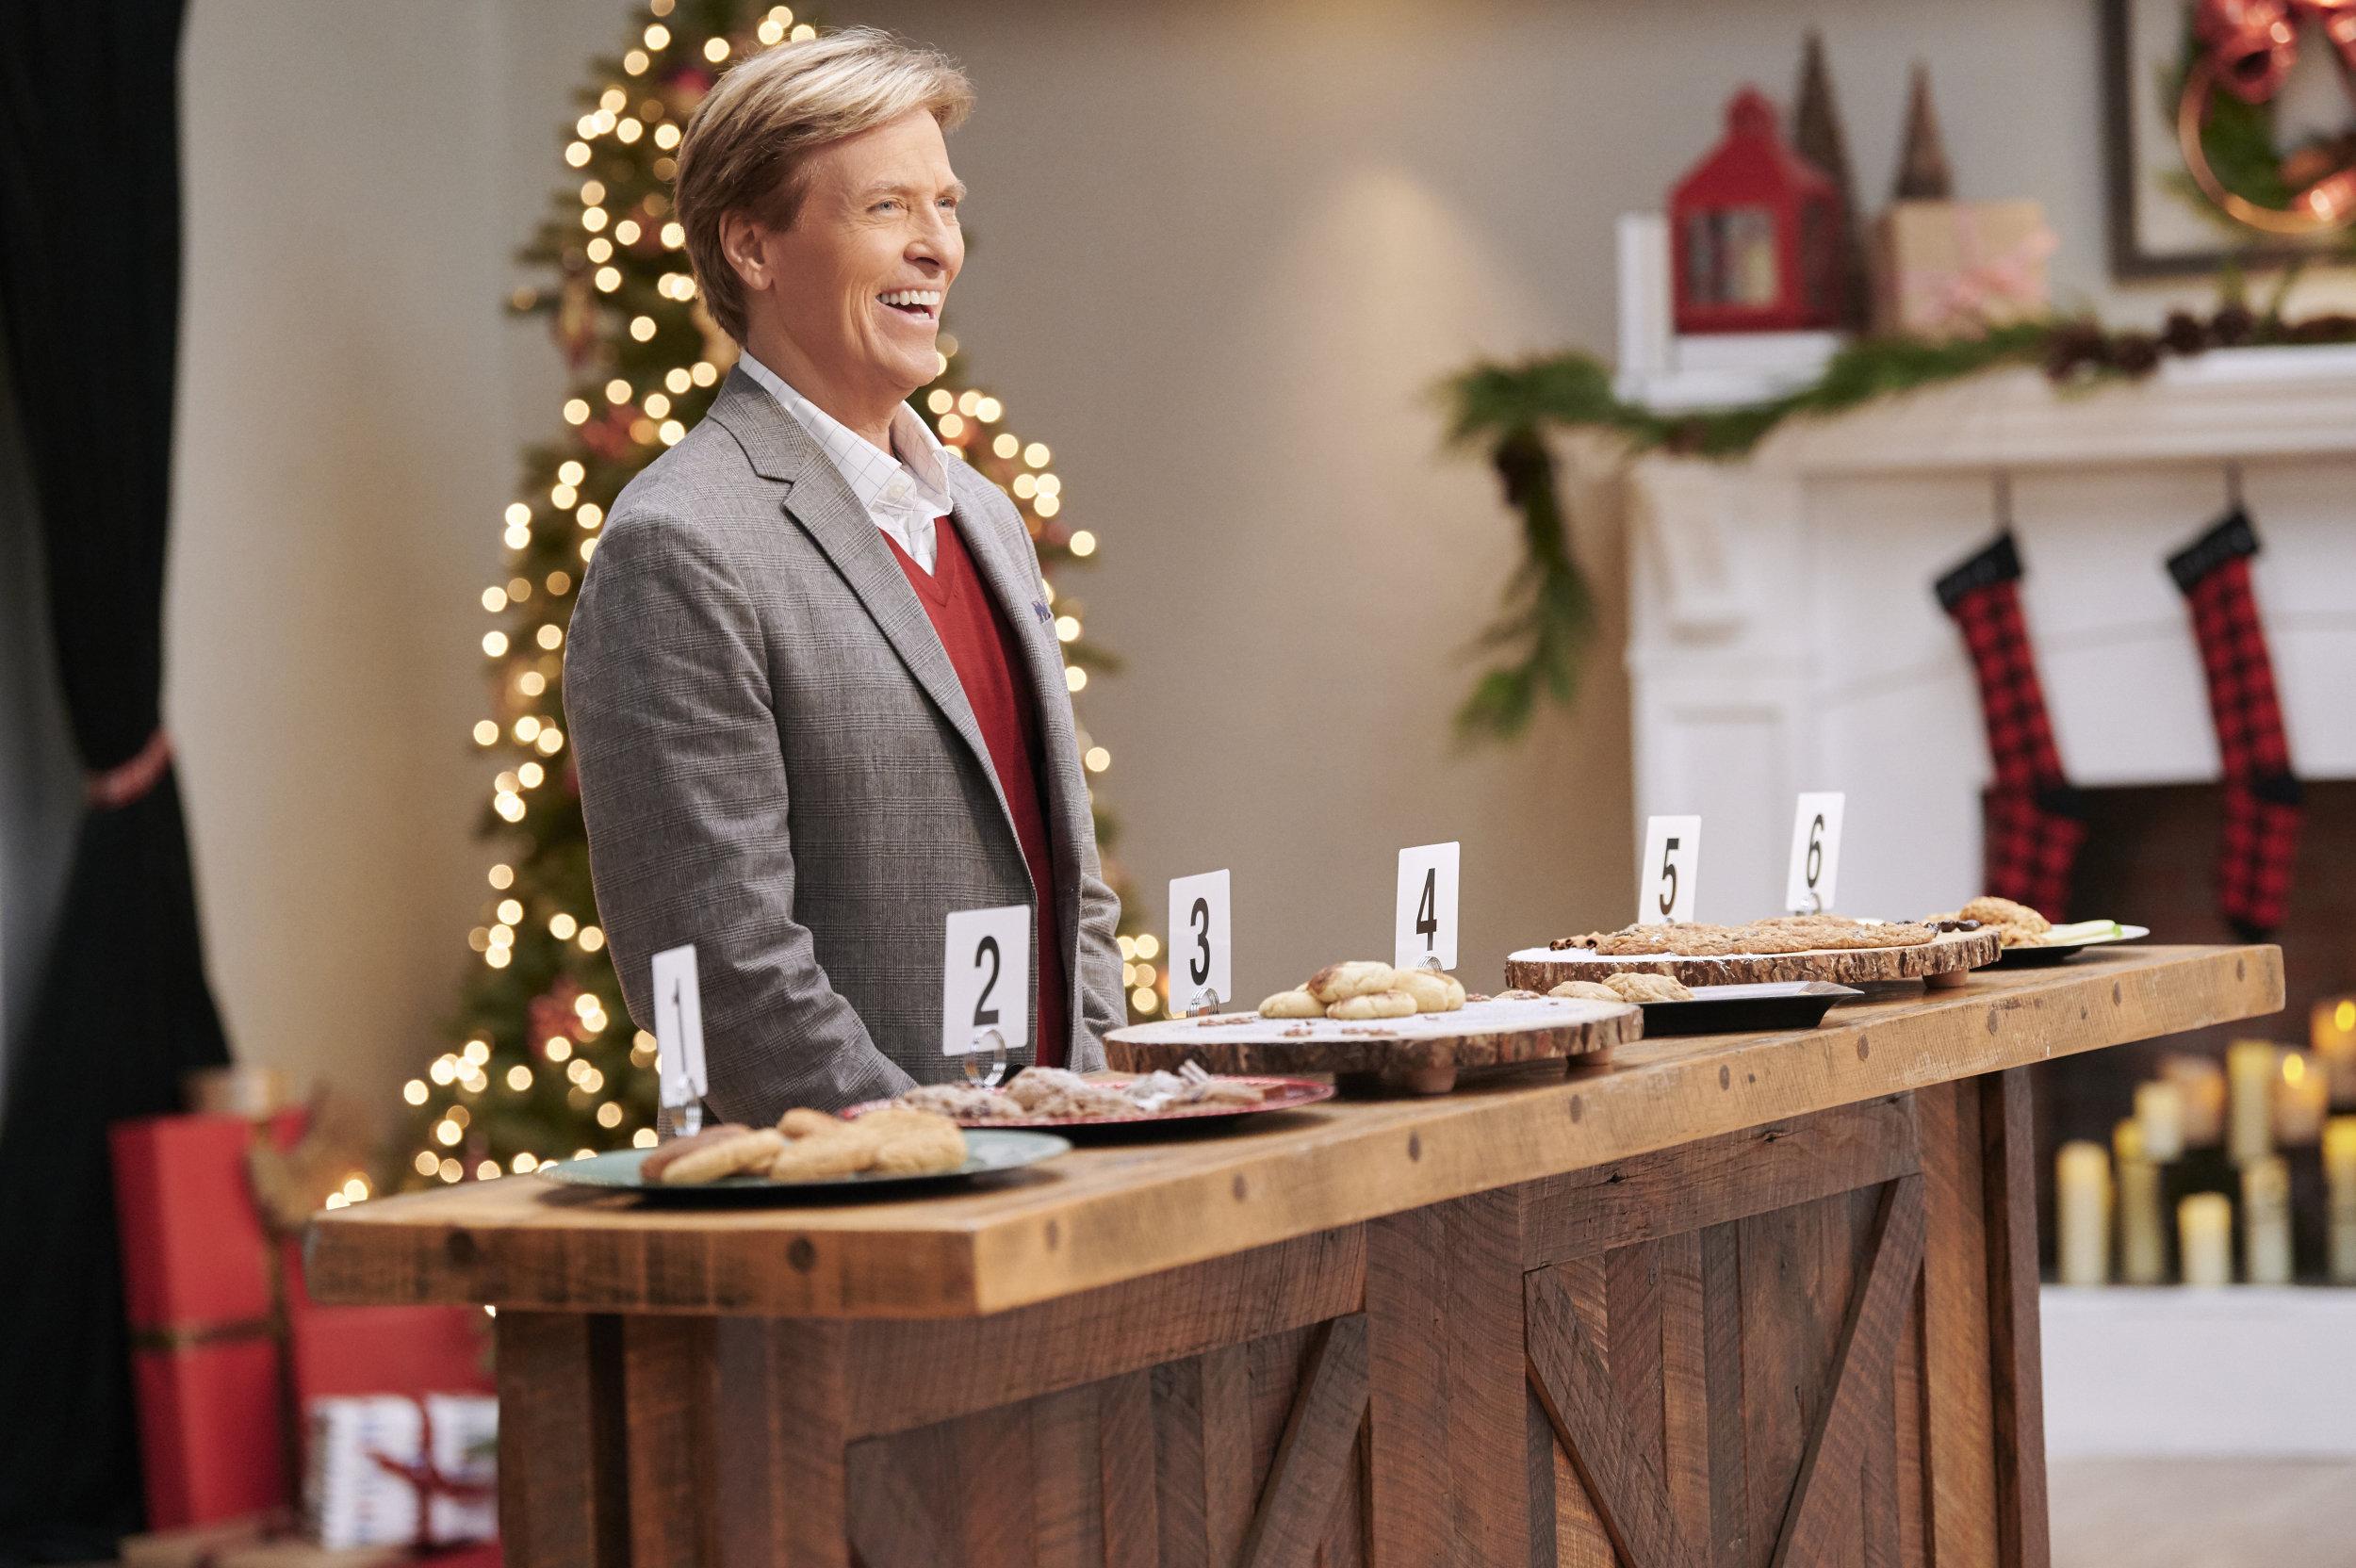 Christmas Cookie Challenge Judges.Christmas Cookie Matchup Hallmark Drama